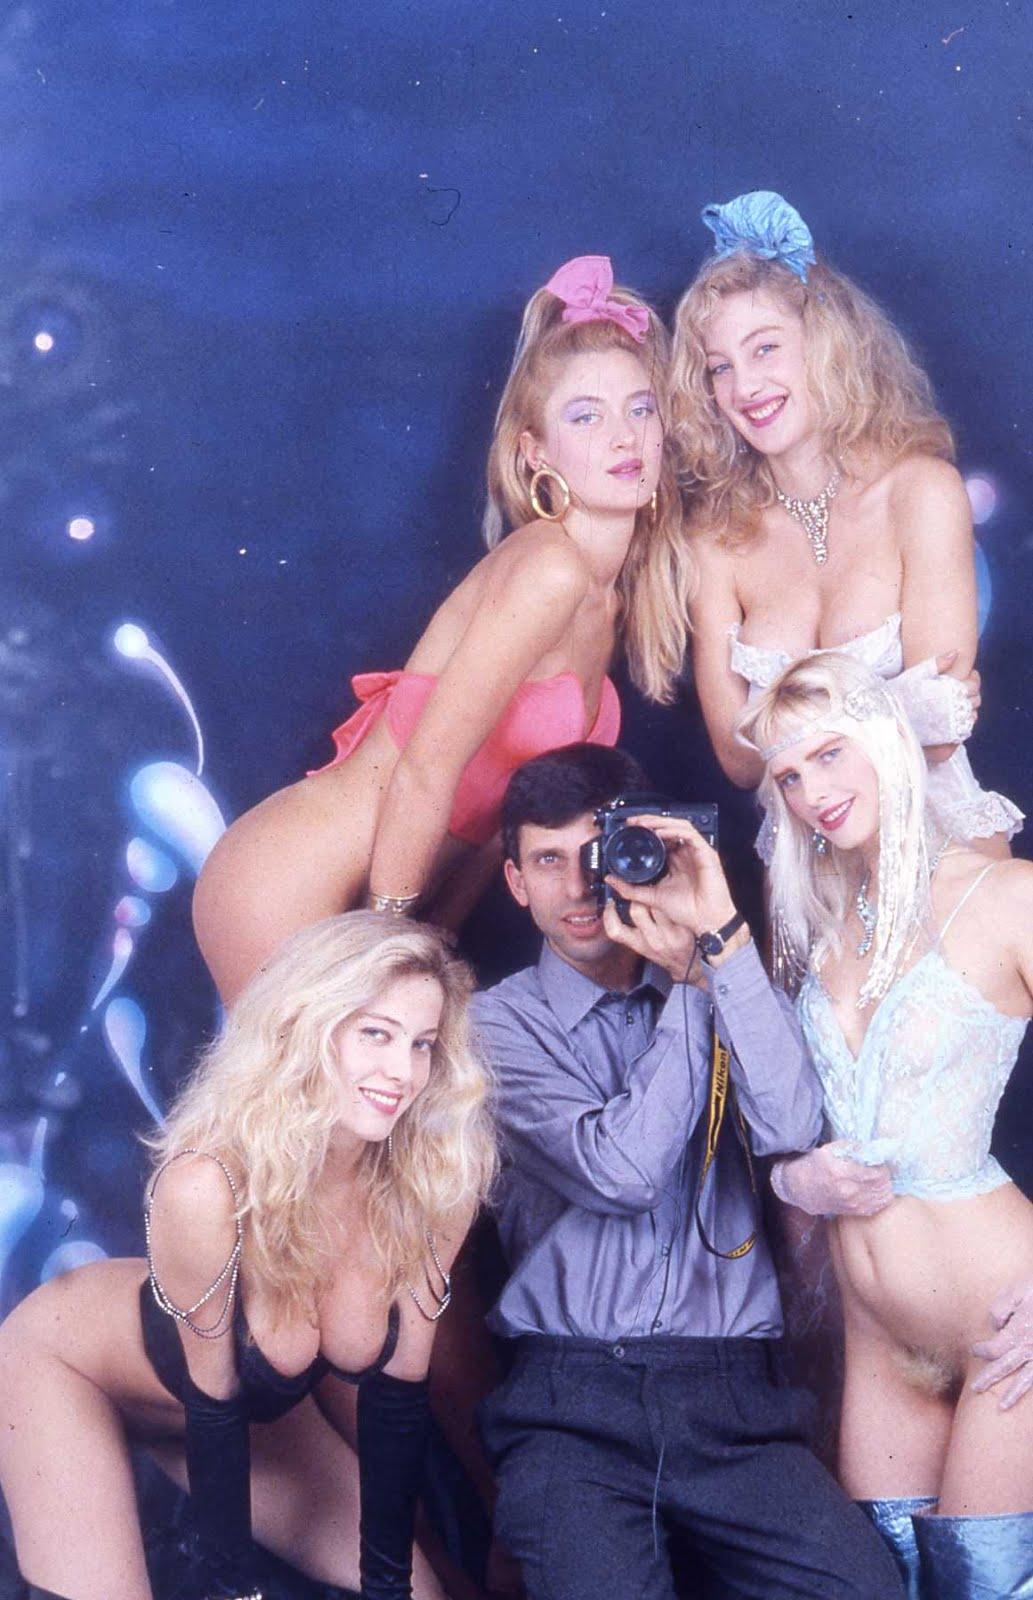 Moana pozzi ilona staller mundial sex - 3 4